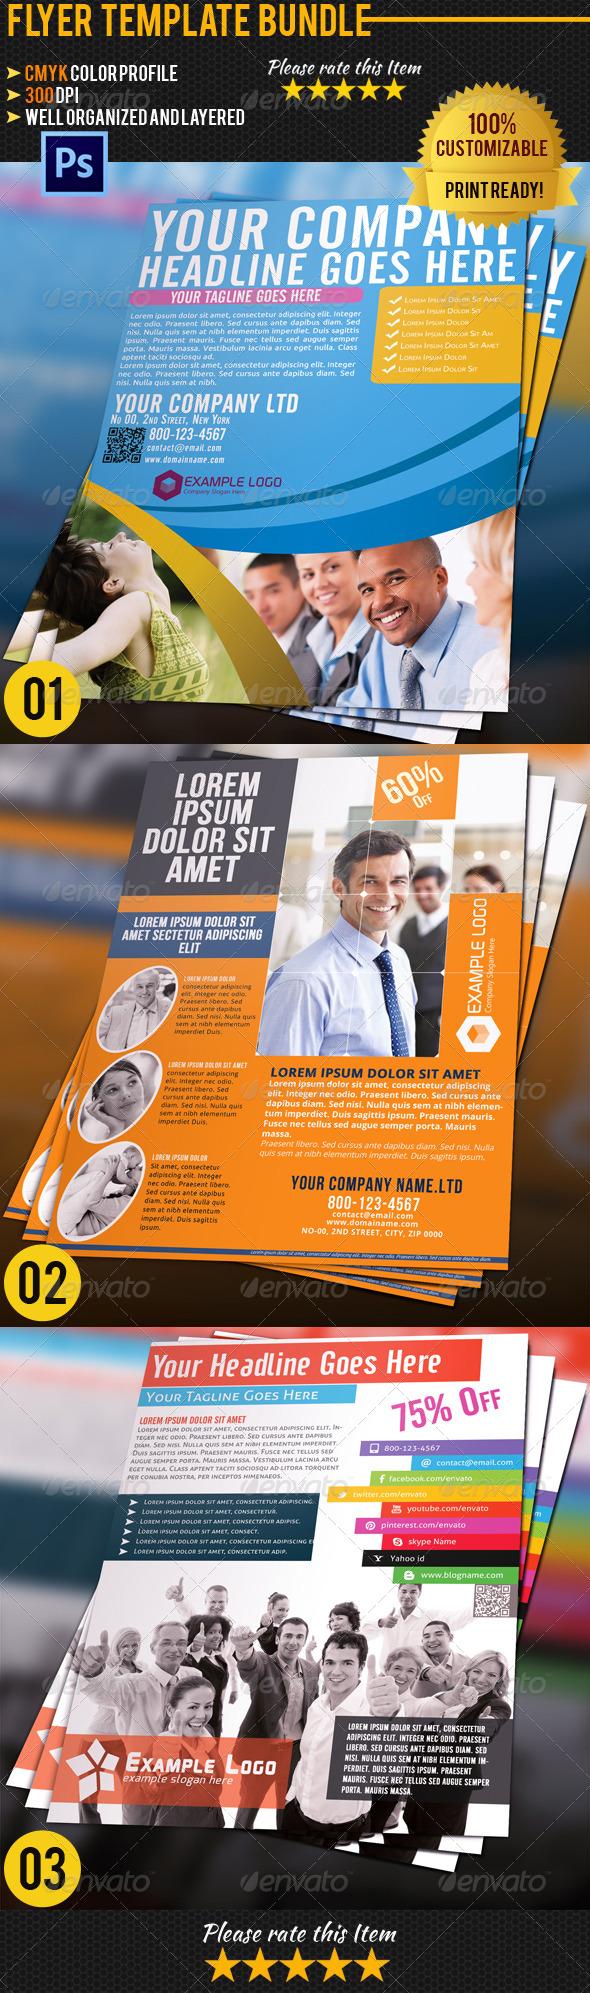 Corporate Business Flyer Bundle 03 - Corporate Flyers